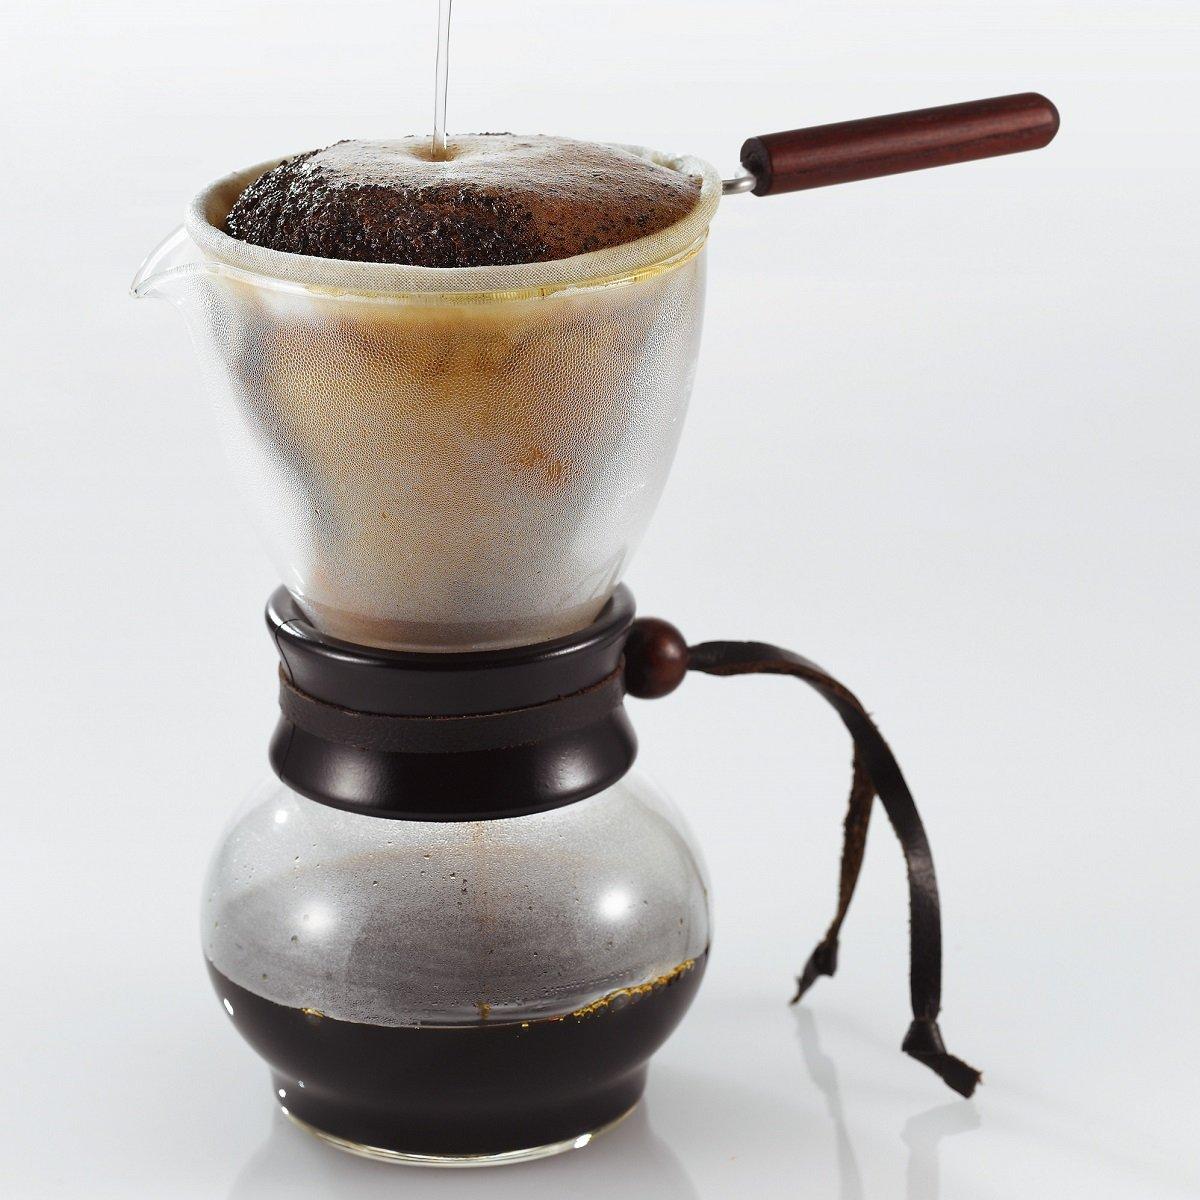 Hario woodneck coffee drip pot - Amazon Com Hario Drip Pot 240ml Drip Coffeemakers Kitchen Dining